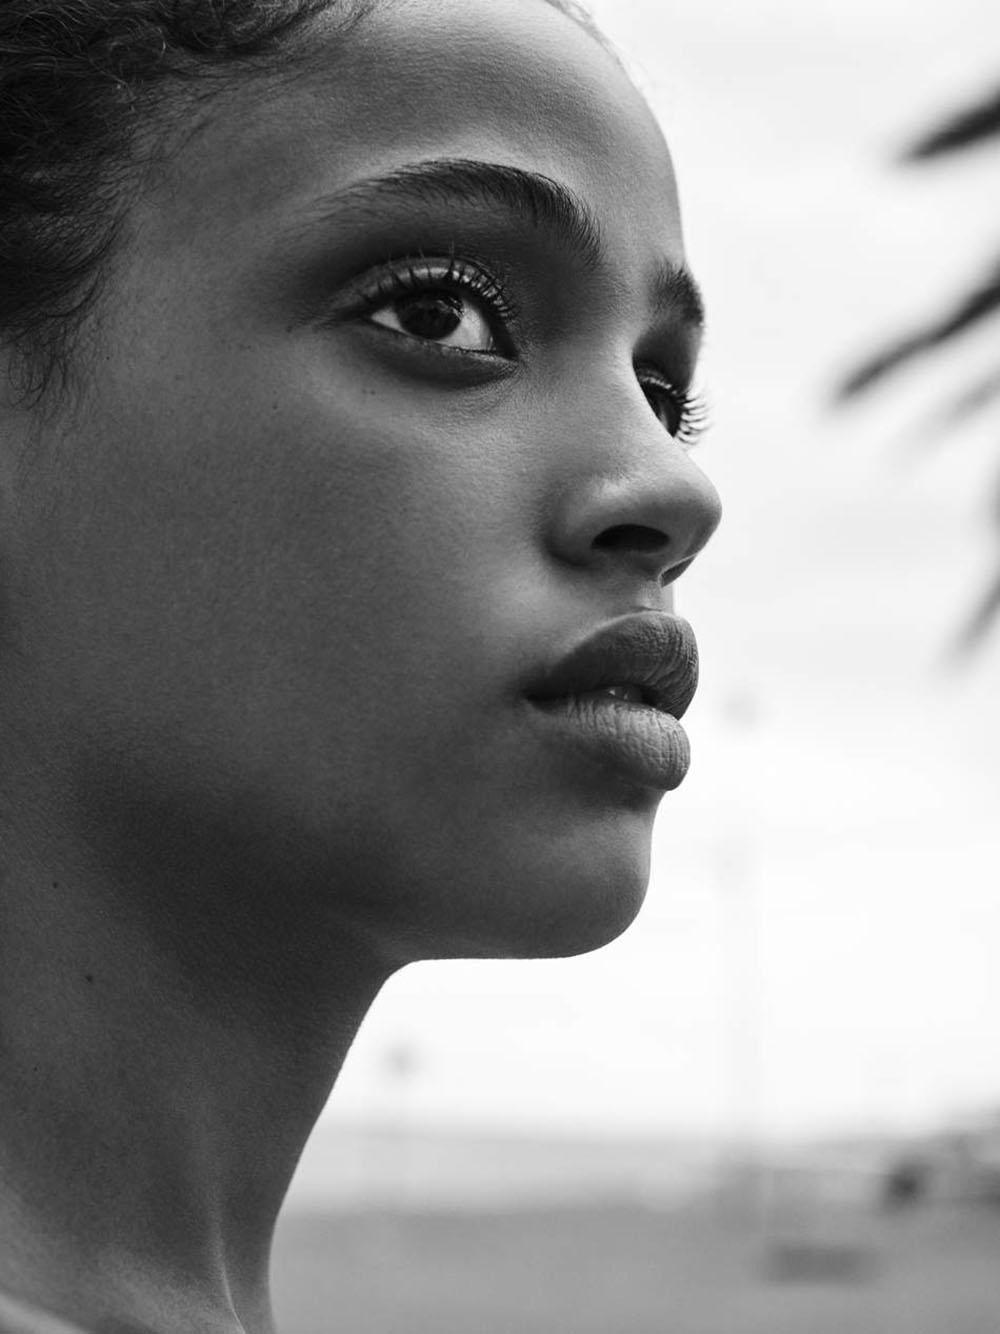 Aya Jones covers Porter Edit June 22nd, 2018 by Stefano Galuzzi